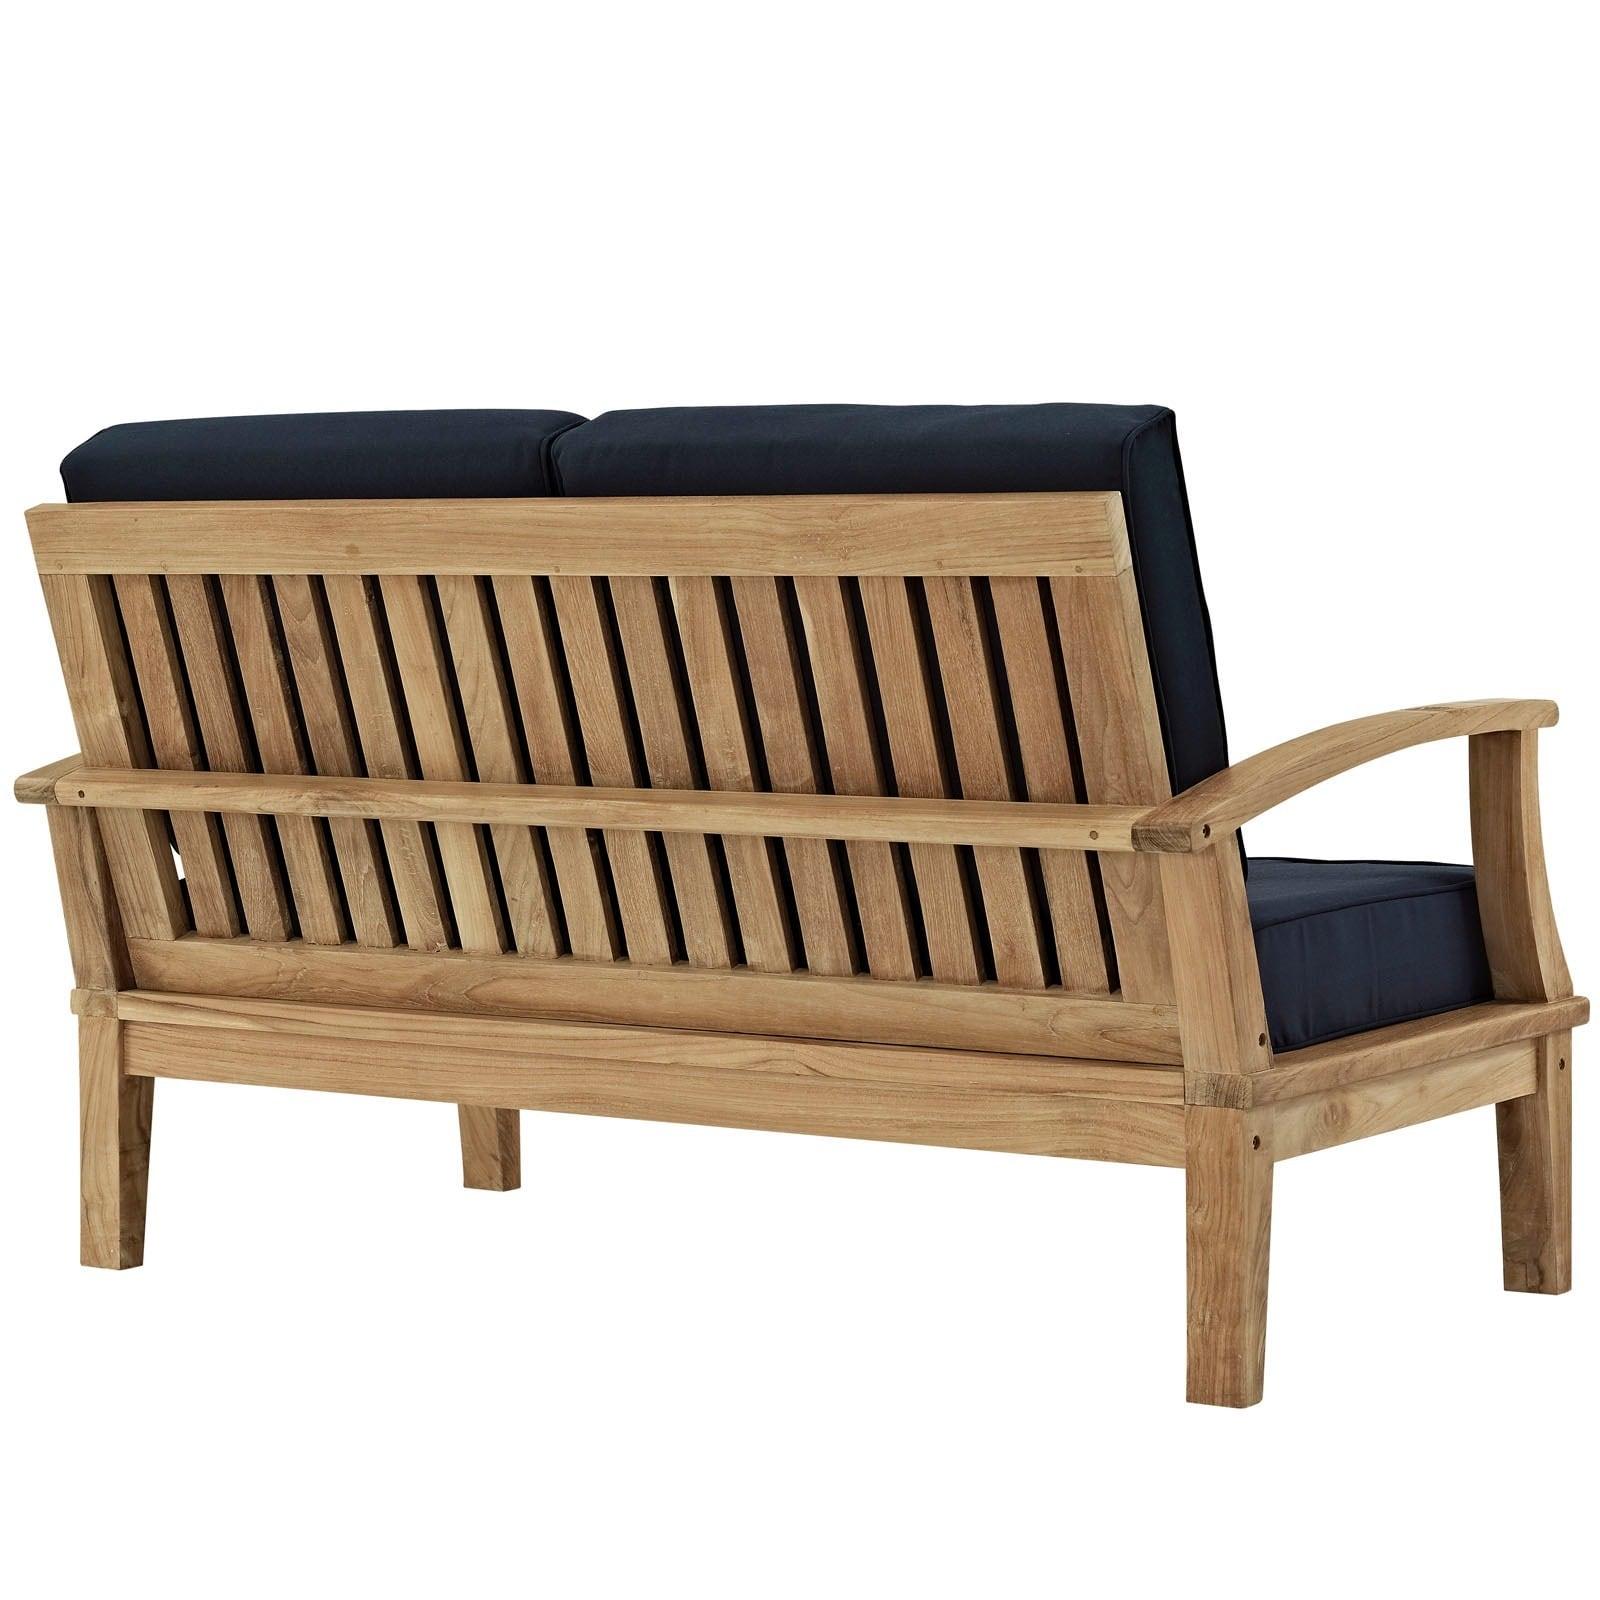 Shop Marina 3 Piece Outdoor Patio Teak Sofa Set   Free Shipping Today    Overstock.com   9070673